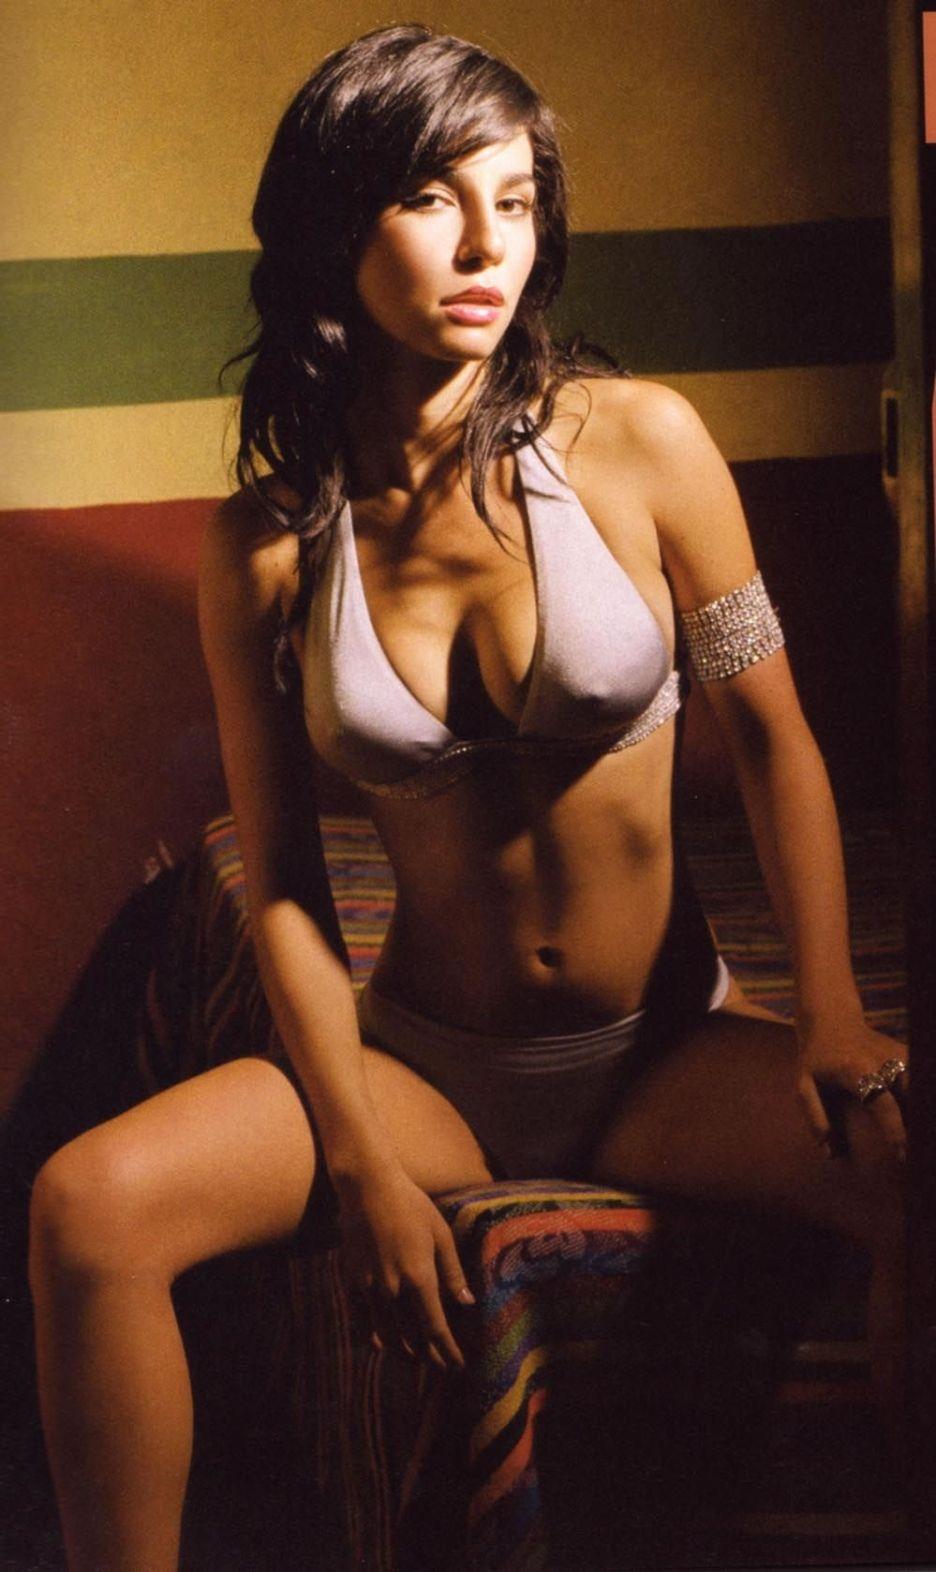 Martha Higareda sexy abs